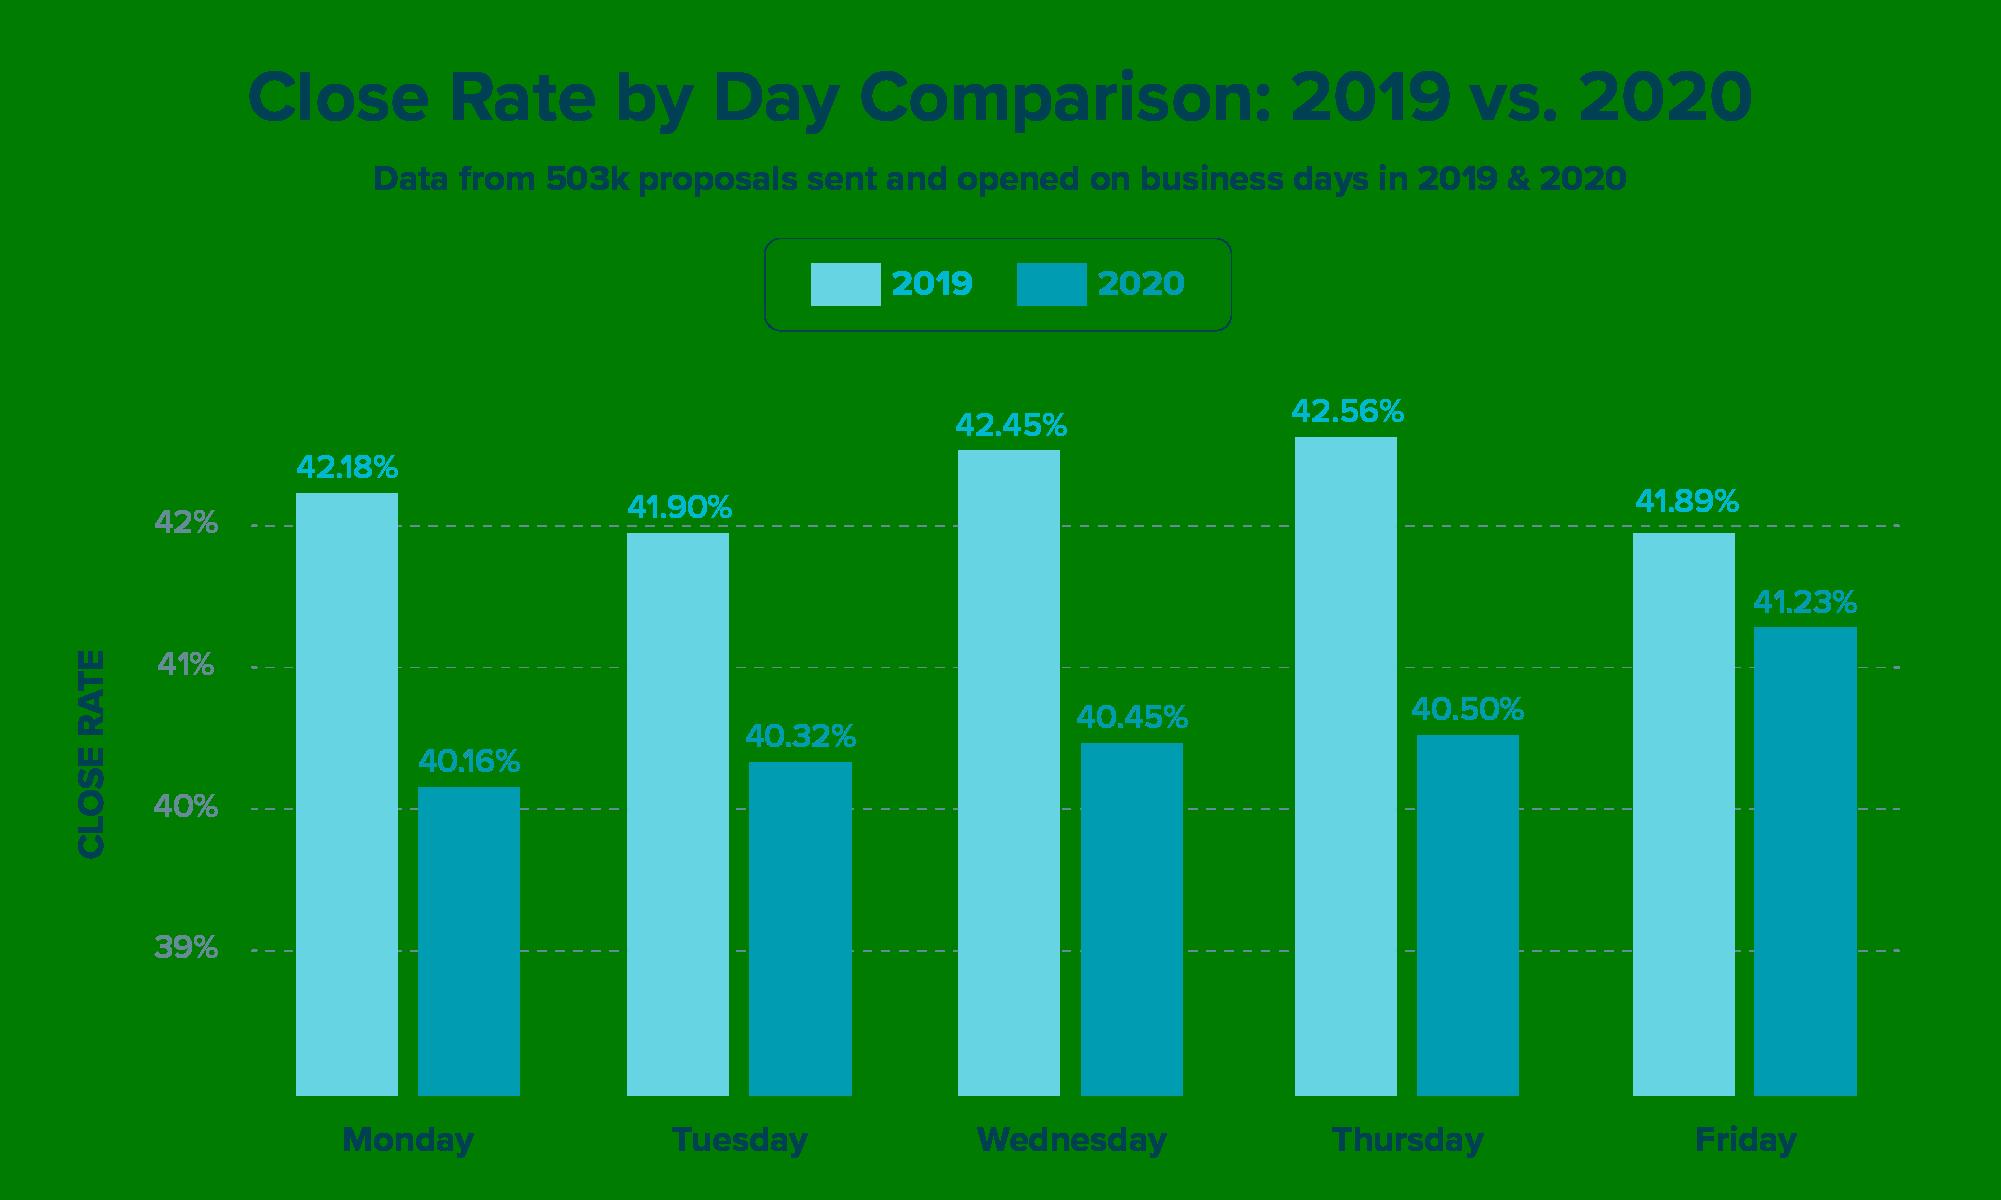 Close Rate by Day Comparison: 2019 vs. 2020